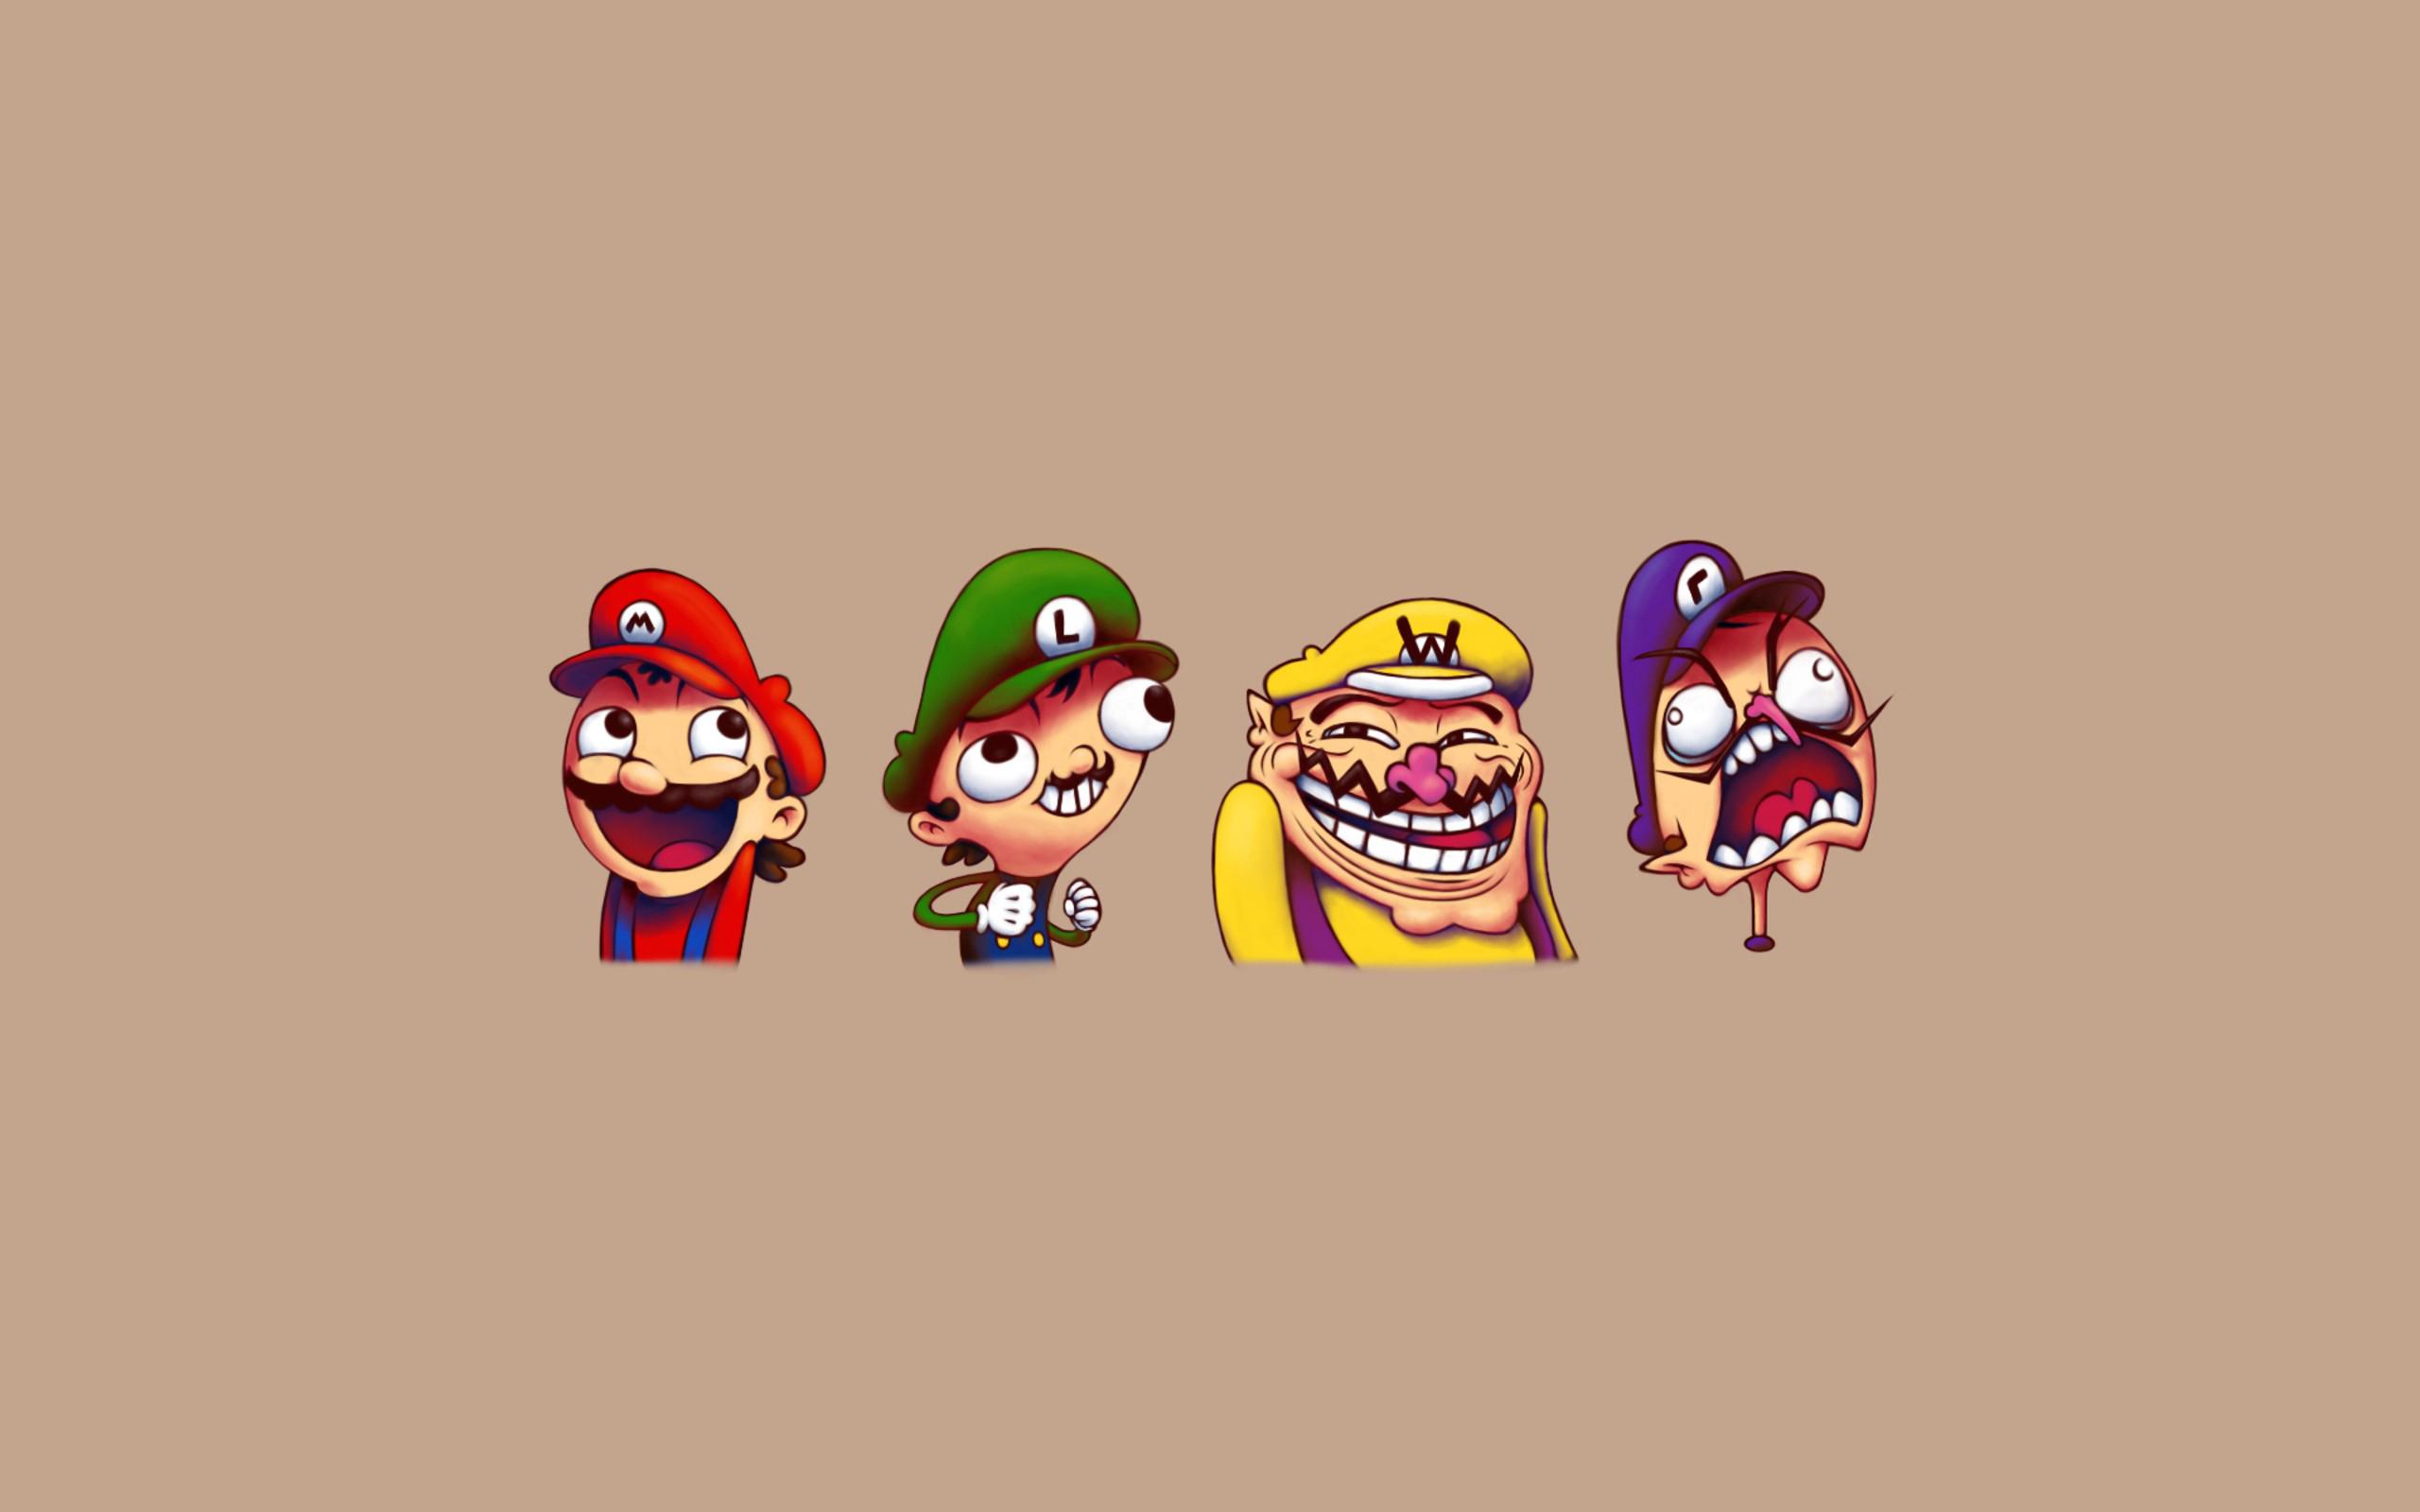 Super mario troll face wallpaper 2560x1600 3159 wallpaperup voltagebd Image collections